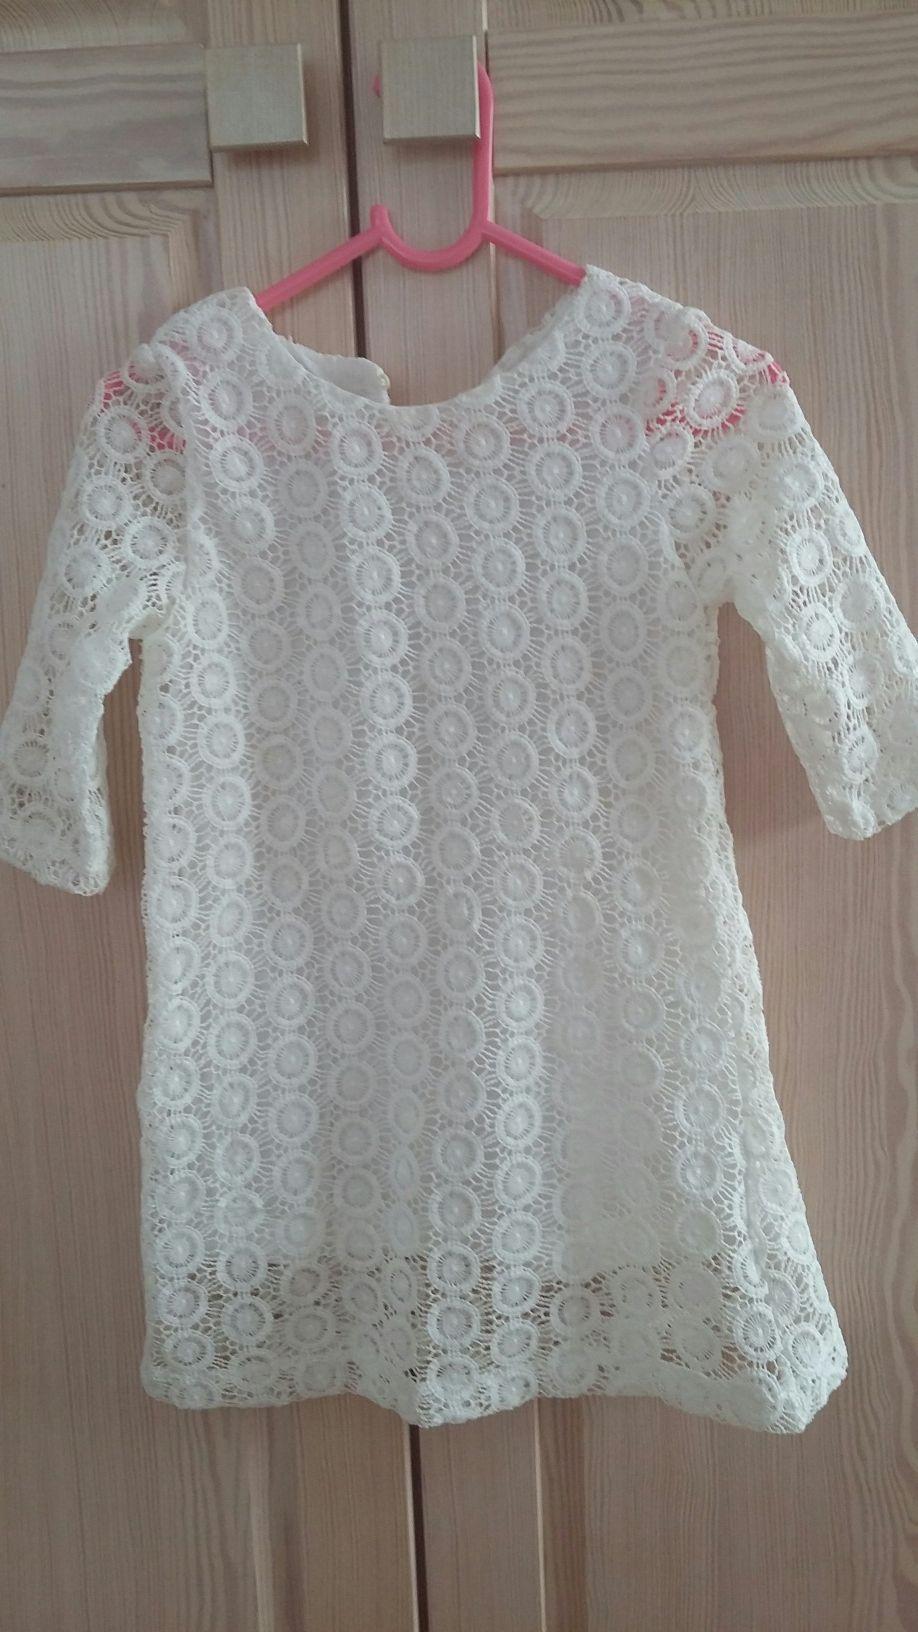 Sukienka koronkowa r. 104 NOWA